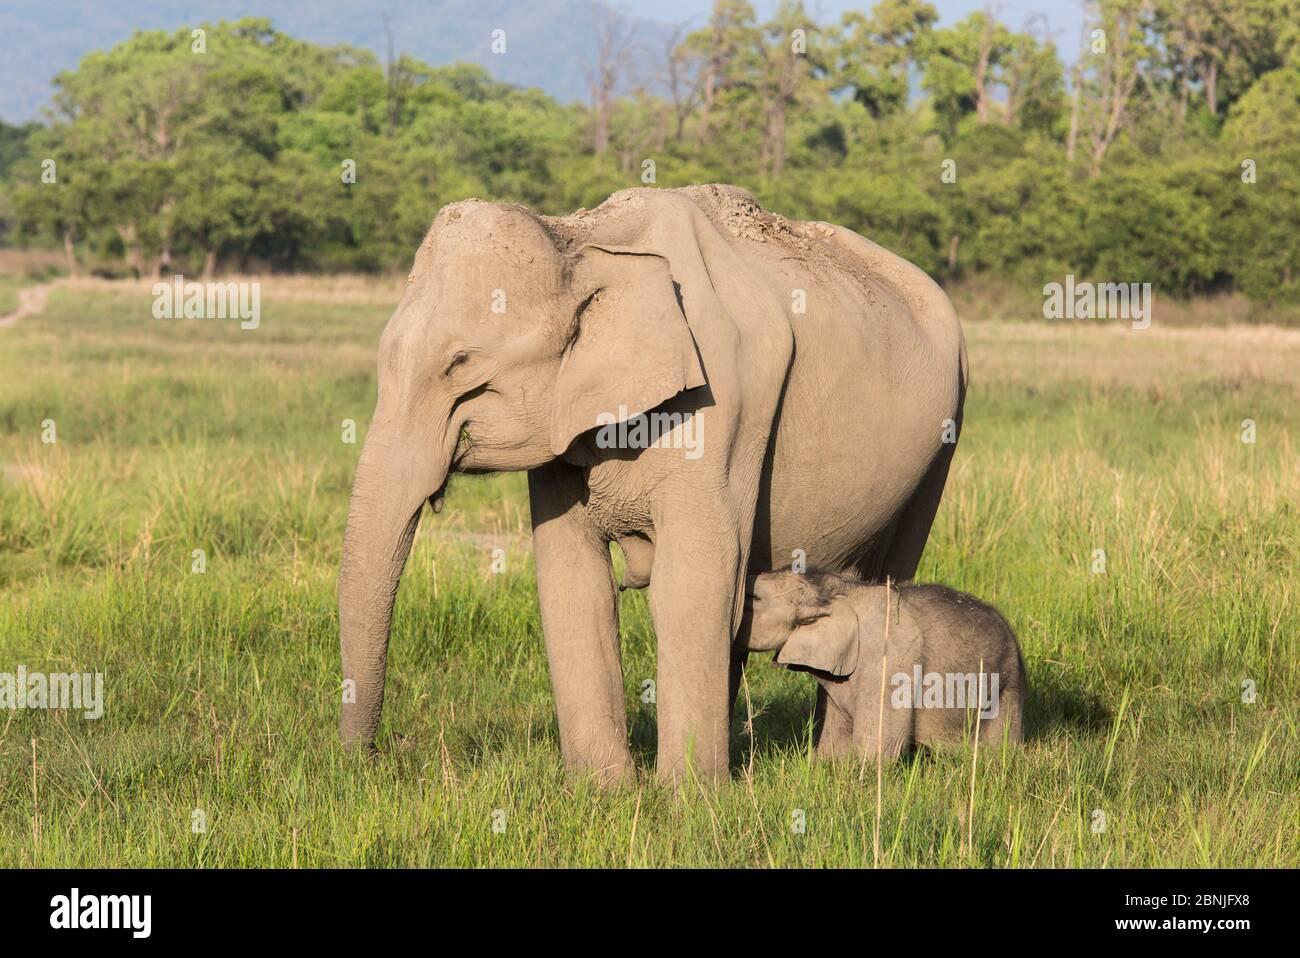 Asiatischer Elefant (Elephas maximus), Kalb säugt, während Mutter Gras füttert. Jim Corbett National Park, Indien. Stockfoto